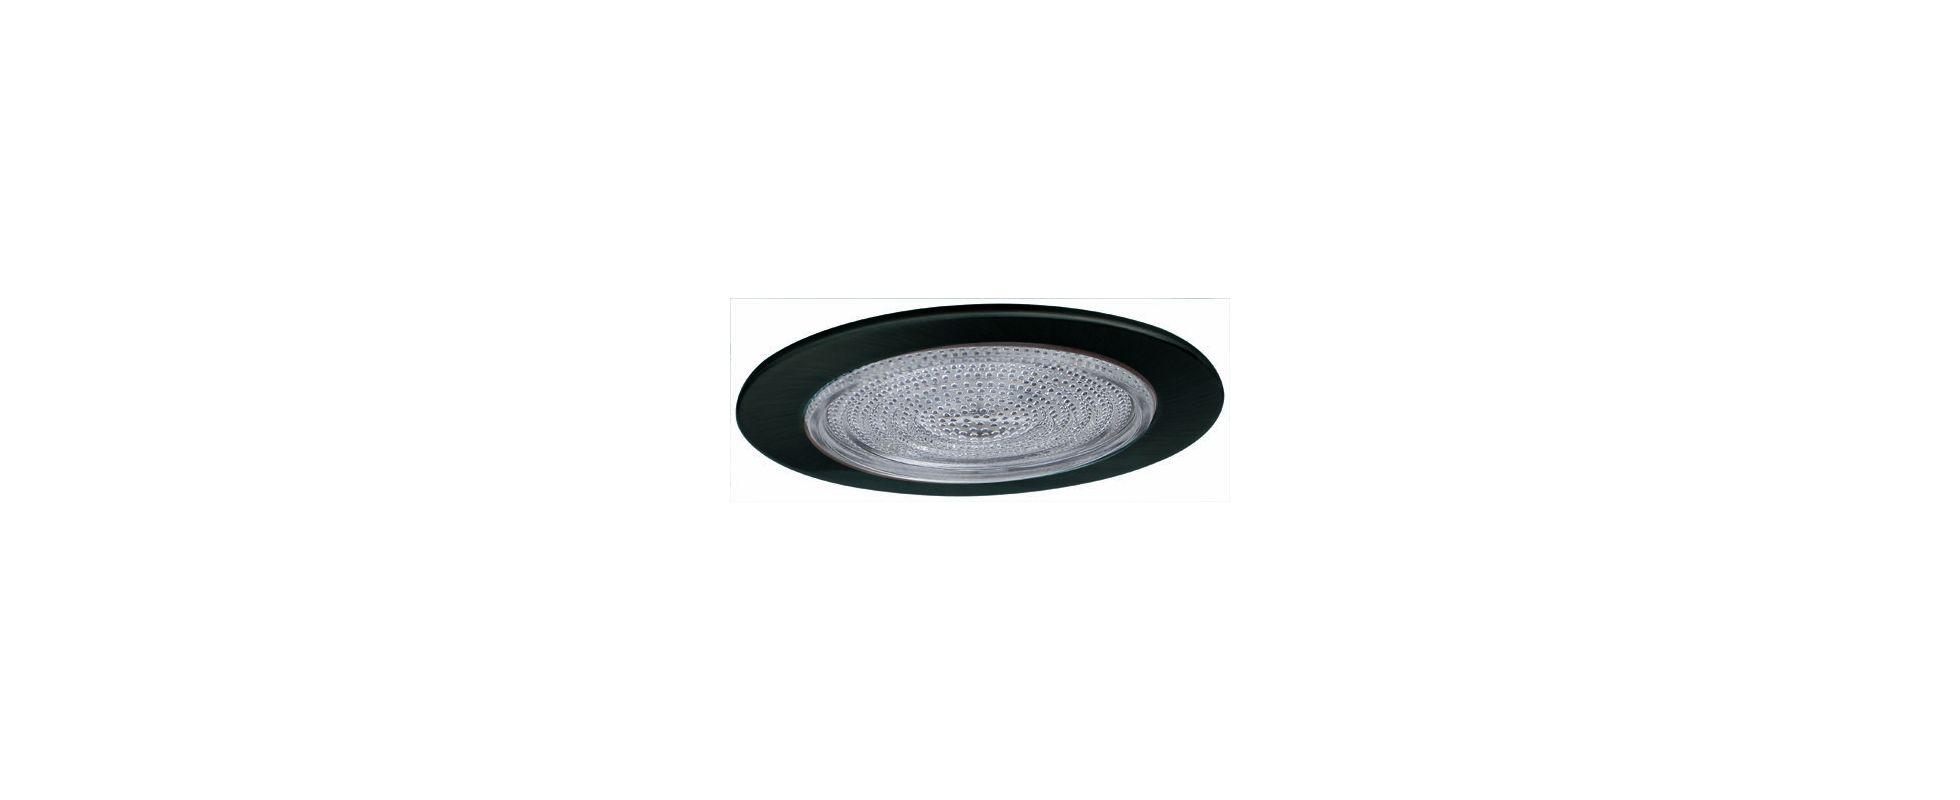 "Fresnel Glass Restoration Bath Light: Elco EL913B Black 4"" Shower Trim With Fresnel Lens"